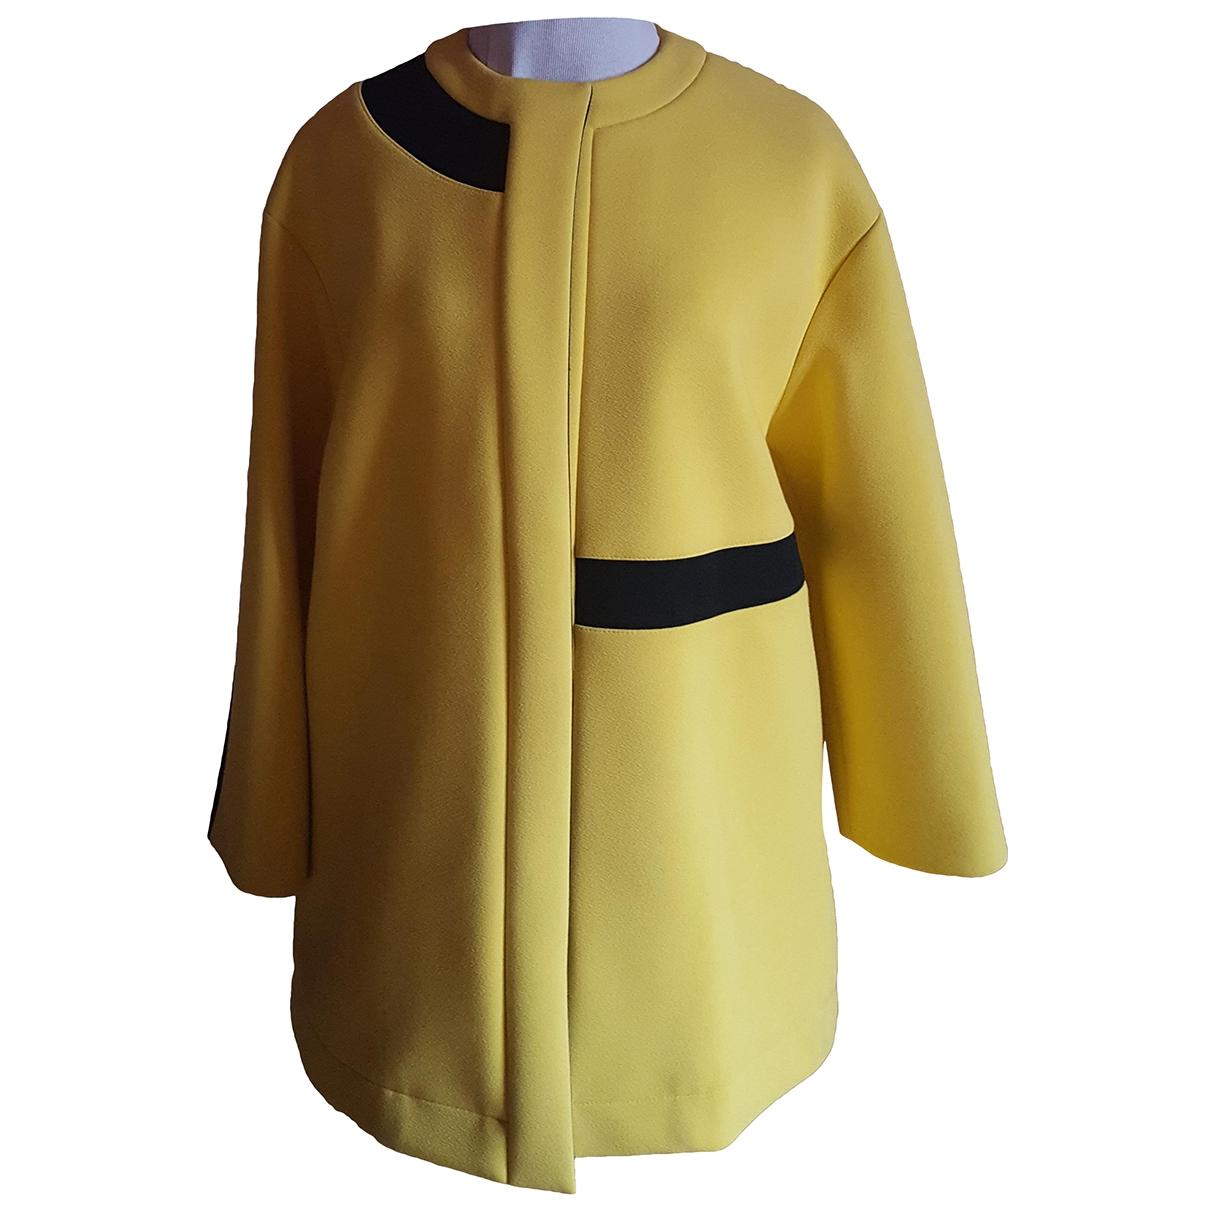 Kenzo \N Yellow coat for Women 40 FR